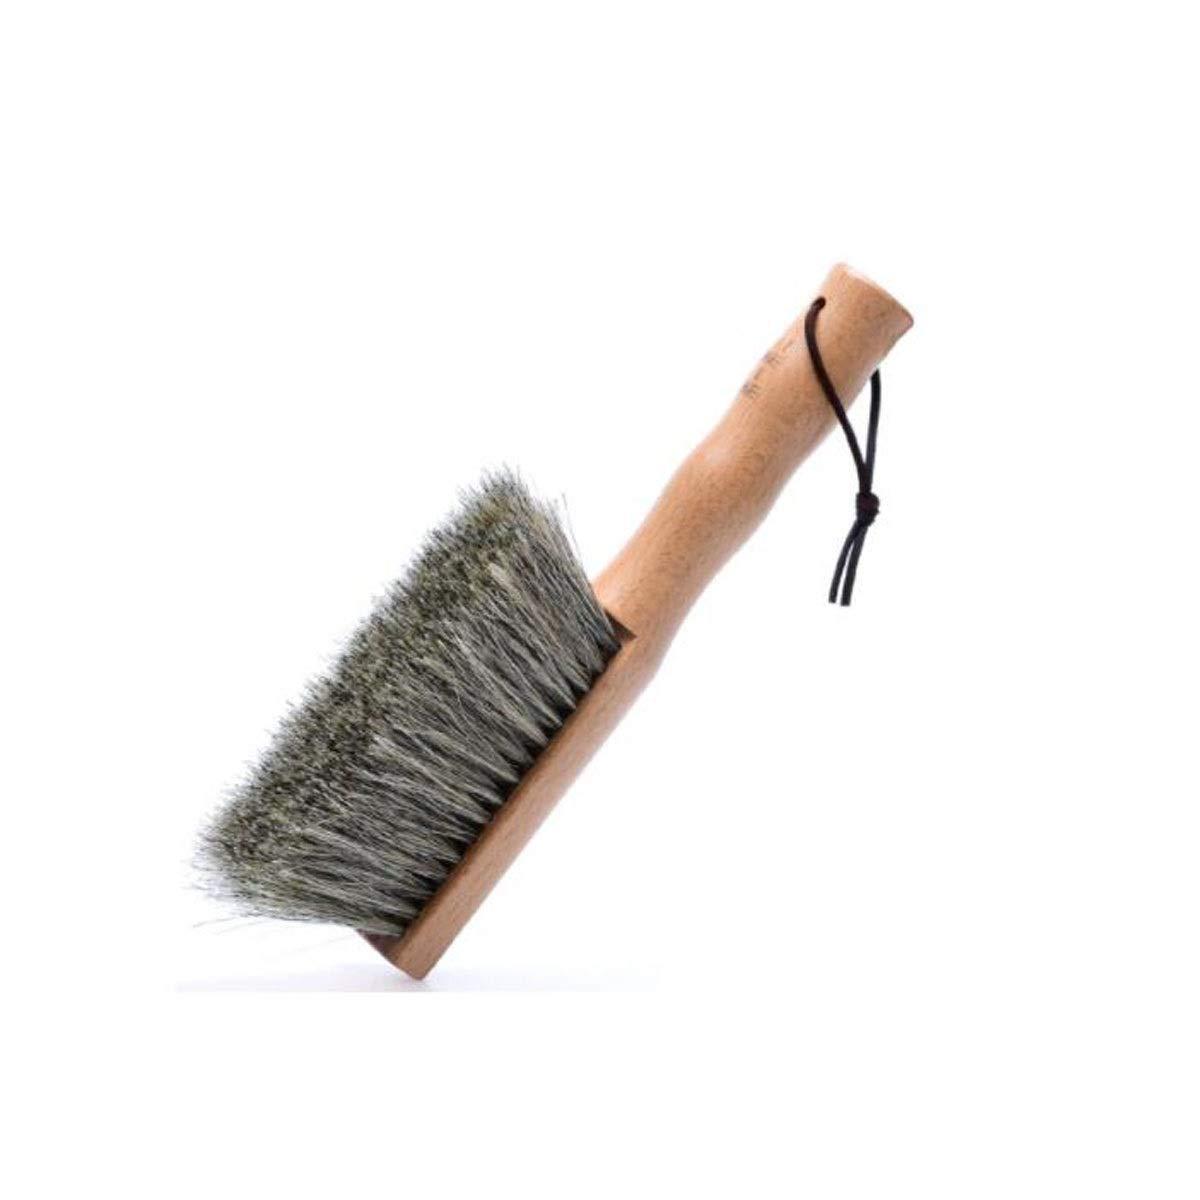 SHENGSHIHUIZHONG Horse Hair Sweeping Brush, Dusting Brush, Bedroom Soft Hair Sweeping Brush, Household Ash Removing Artifact, Eucalyptus Horse Hair Bed Brush Bedding, (Edition : A) by SHENGSHIHUIZHONG